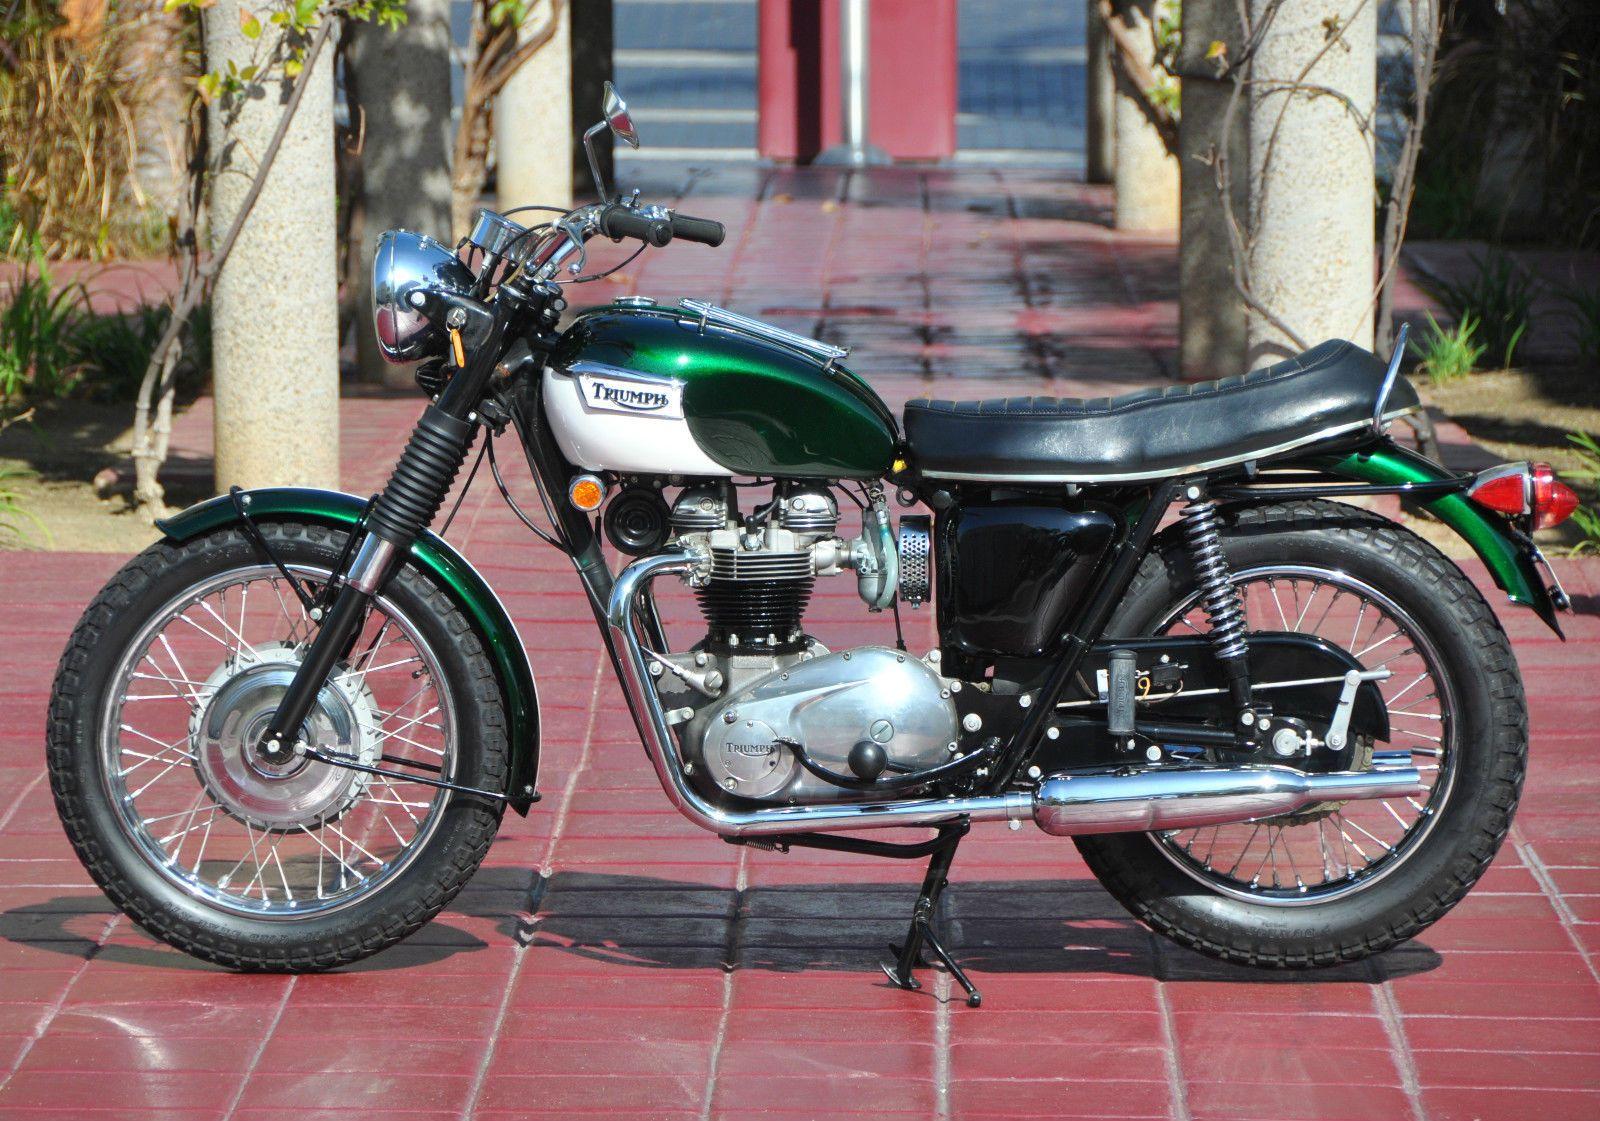 1970 Triumph Tr6 Tiger 650 Triumph Bikes Classic Motorcycles Triumph Motorcycles [ 1121 x 1600 Pixel ]